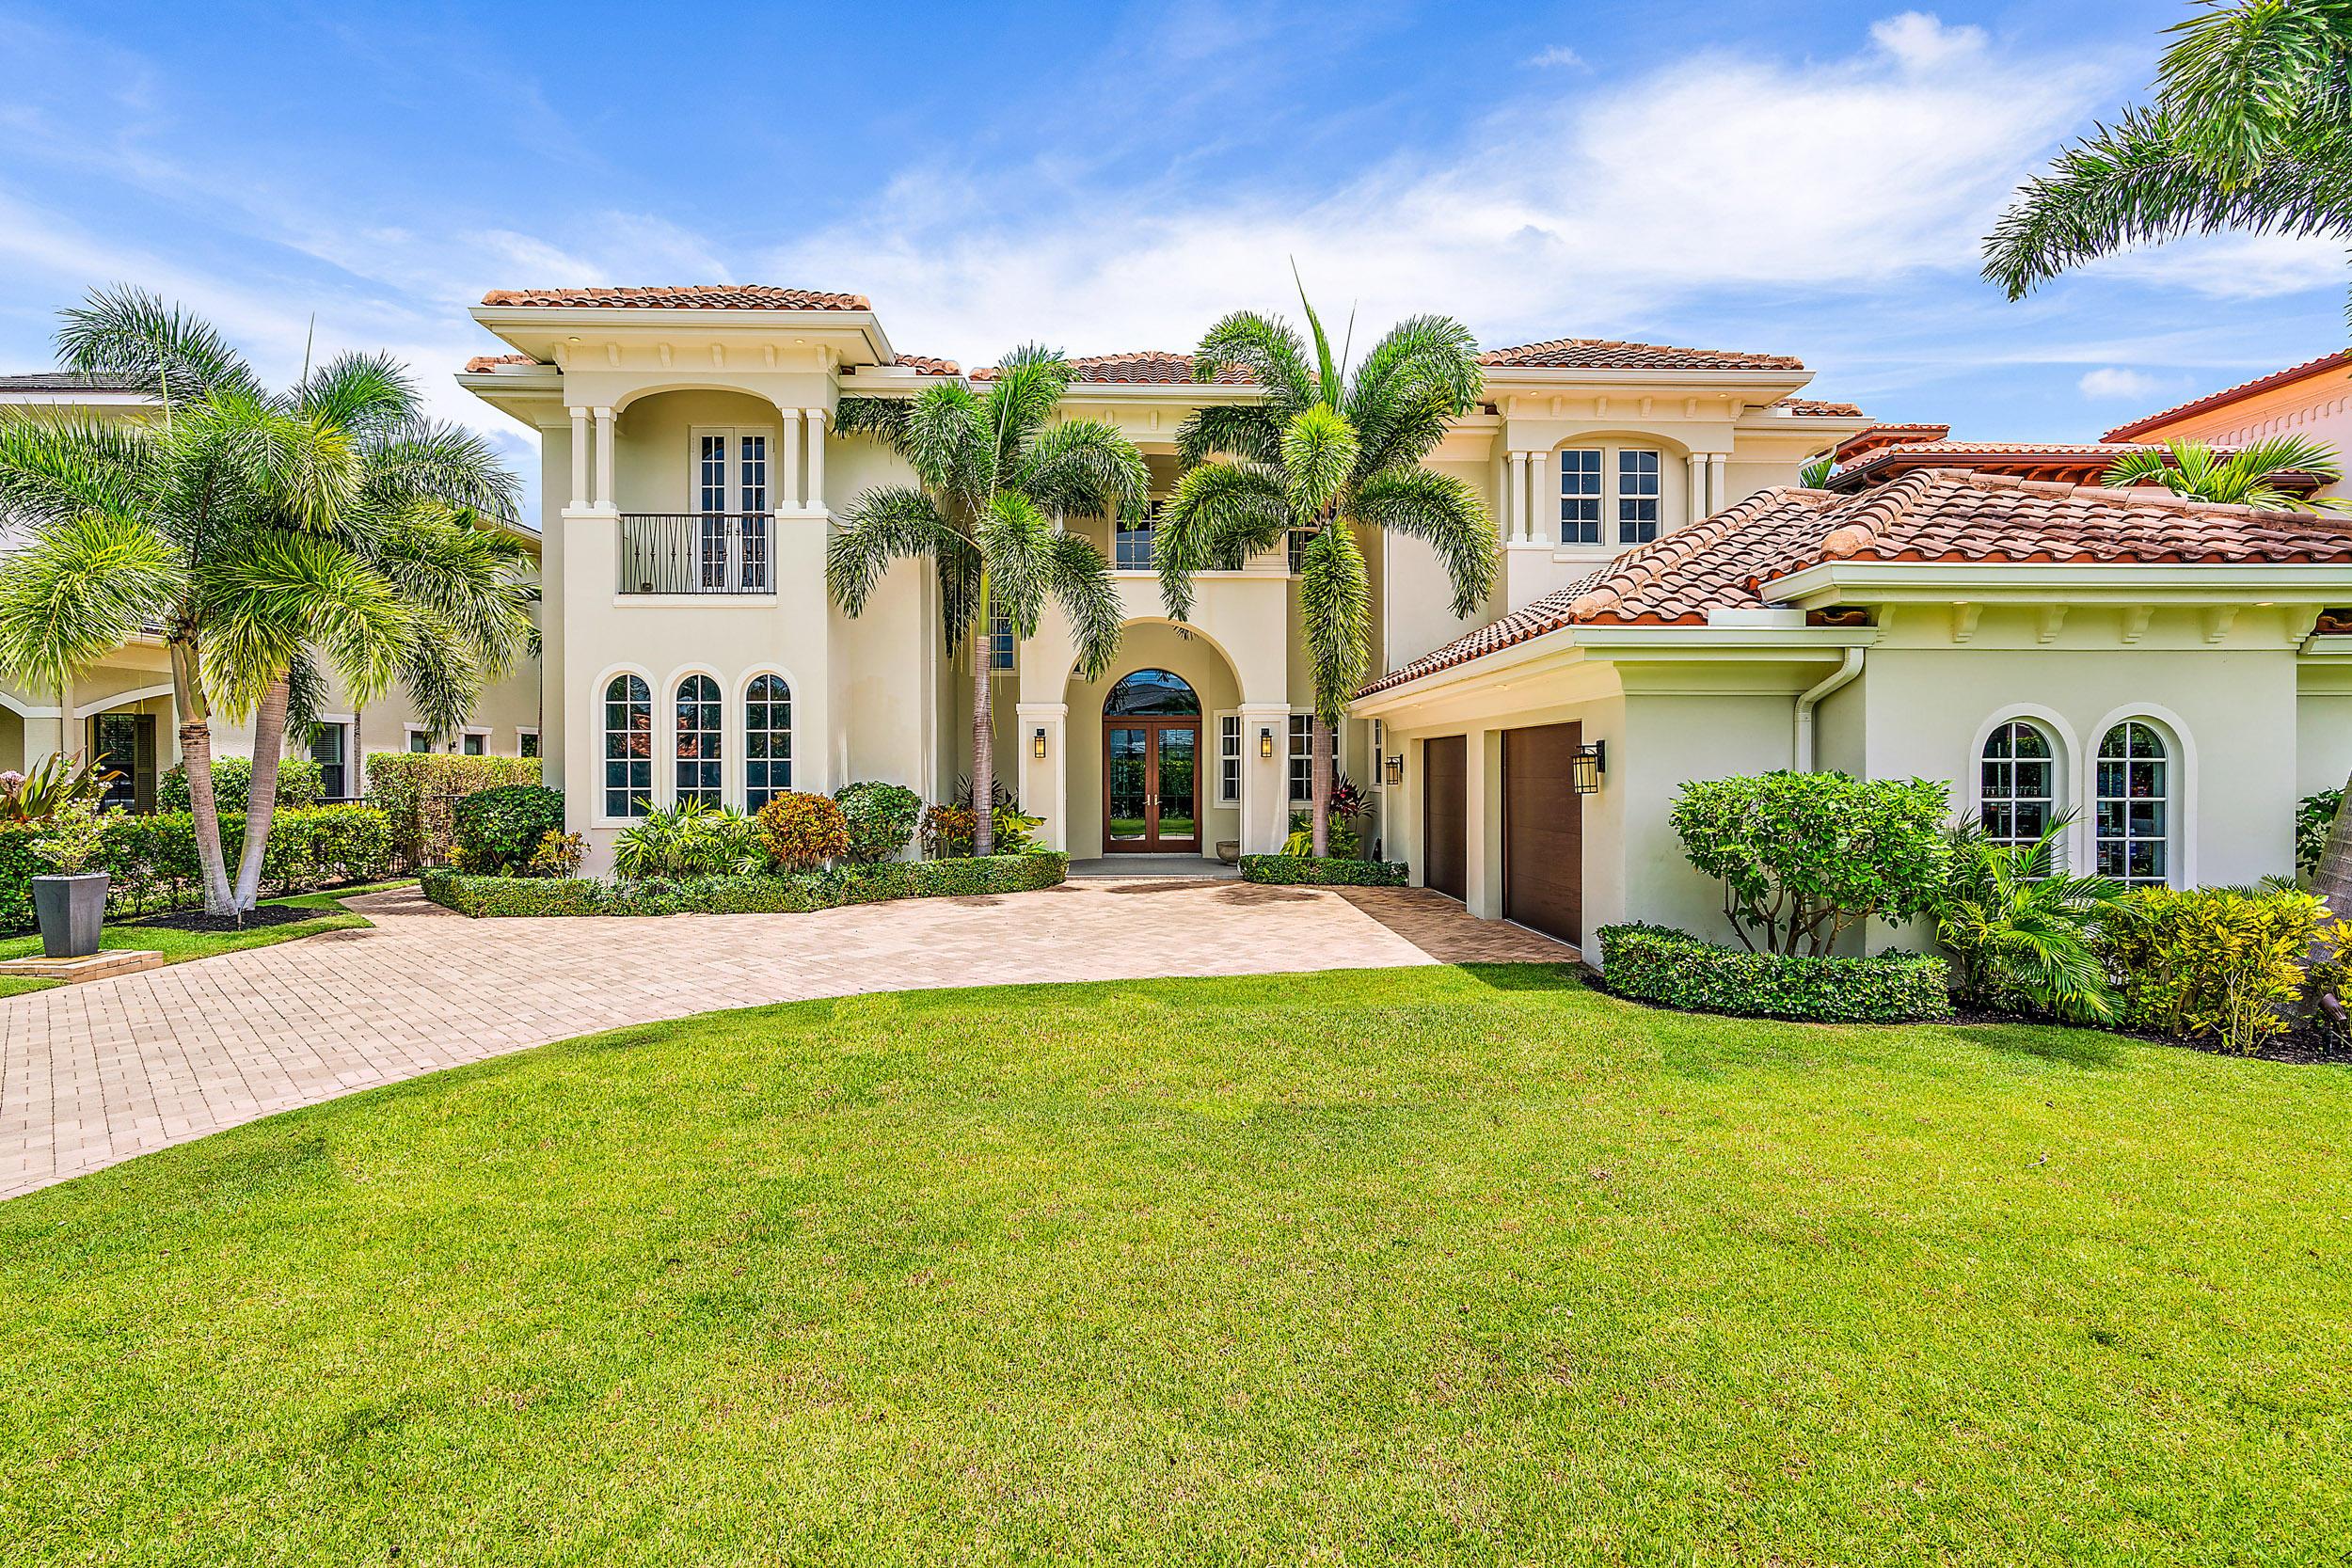 12860 Inshore Drive - Palm Beach Gardens, Florida